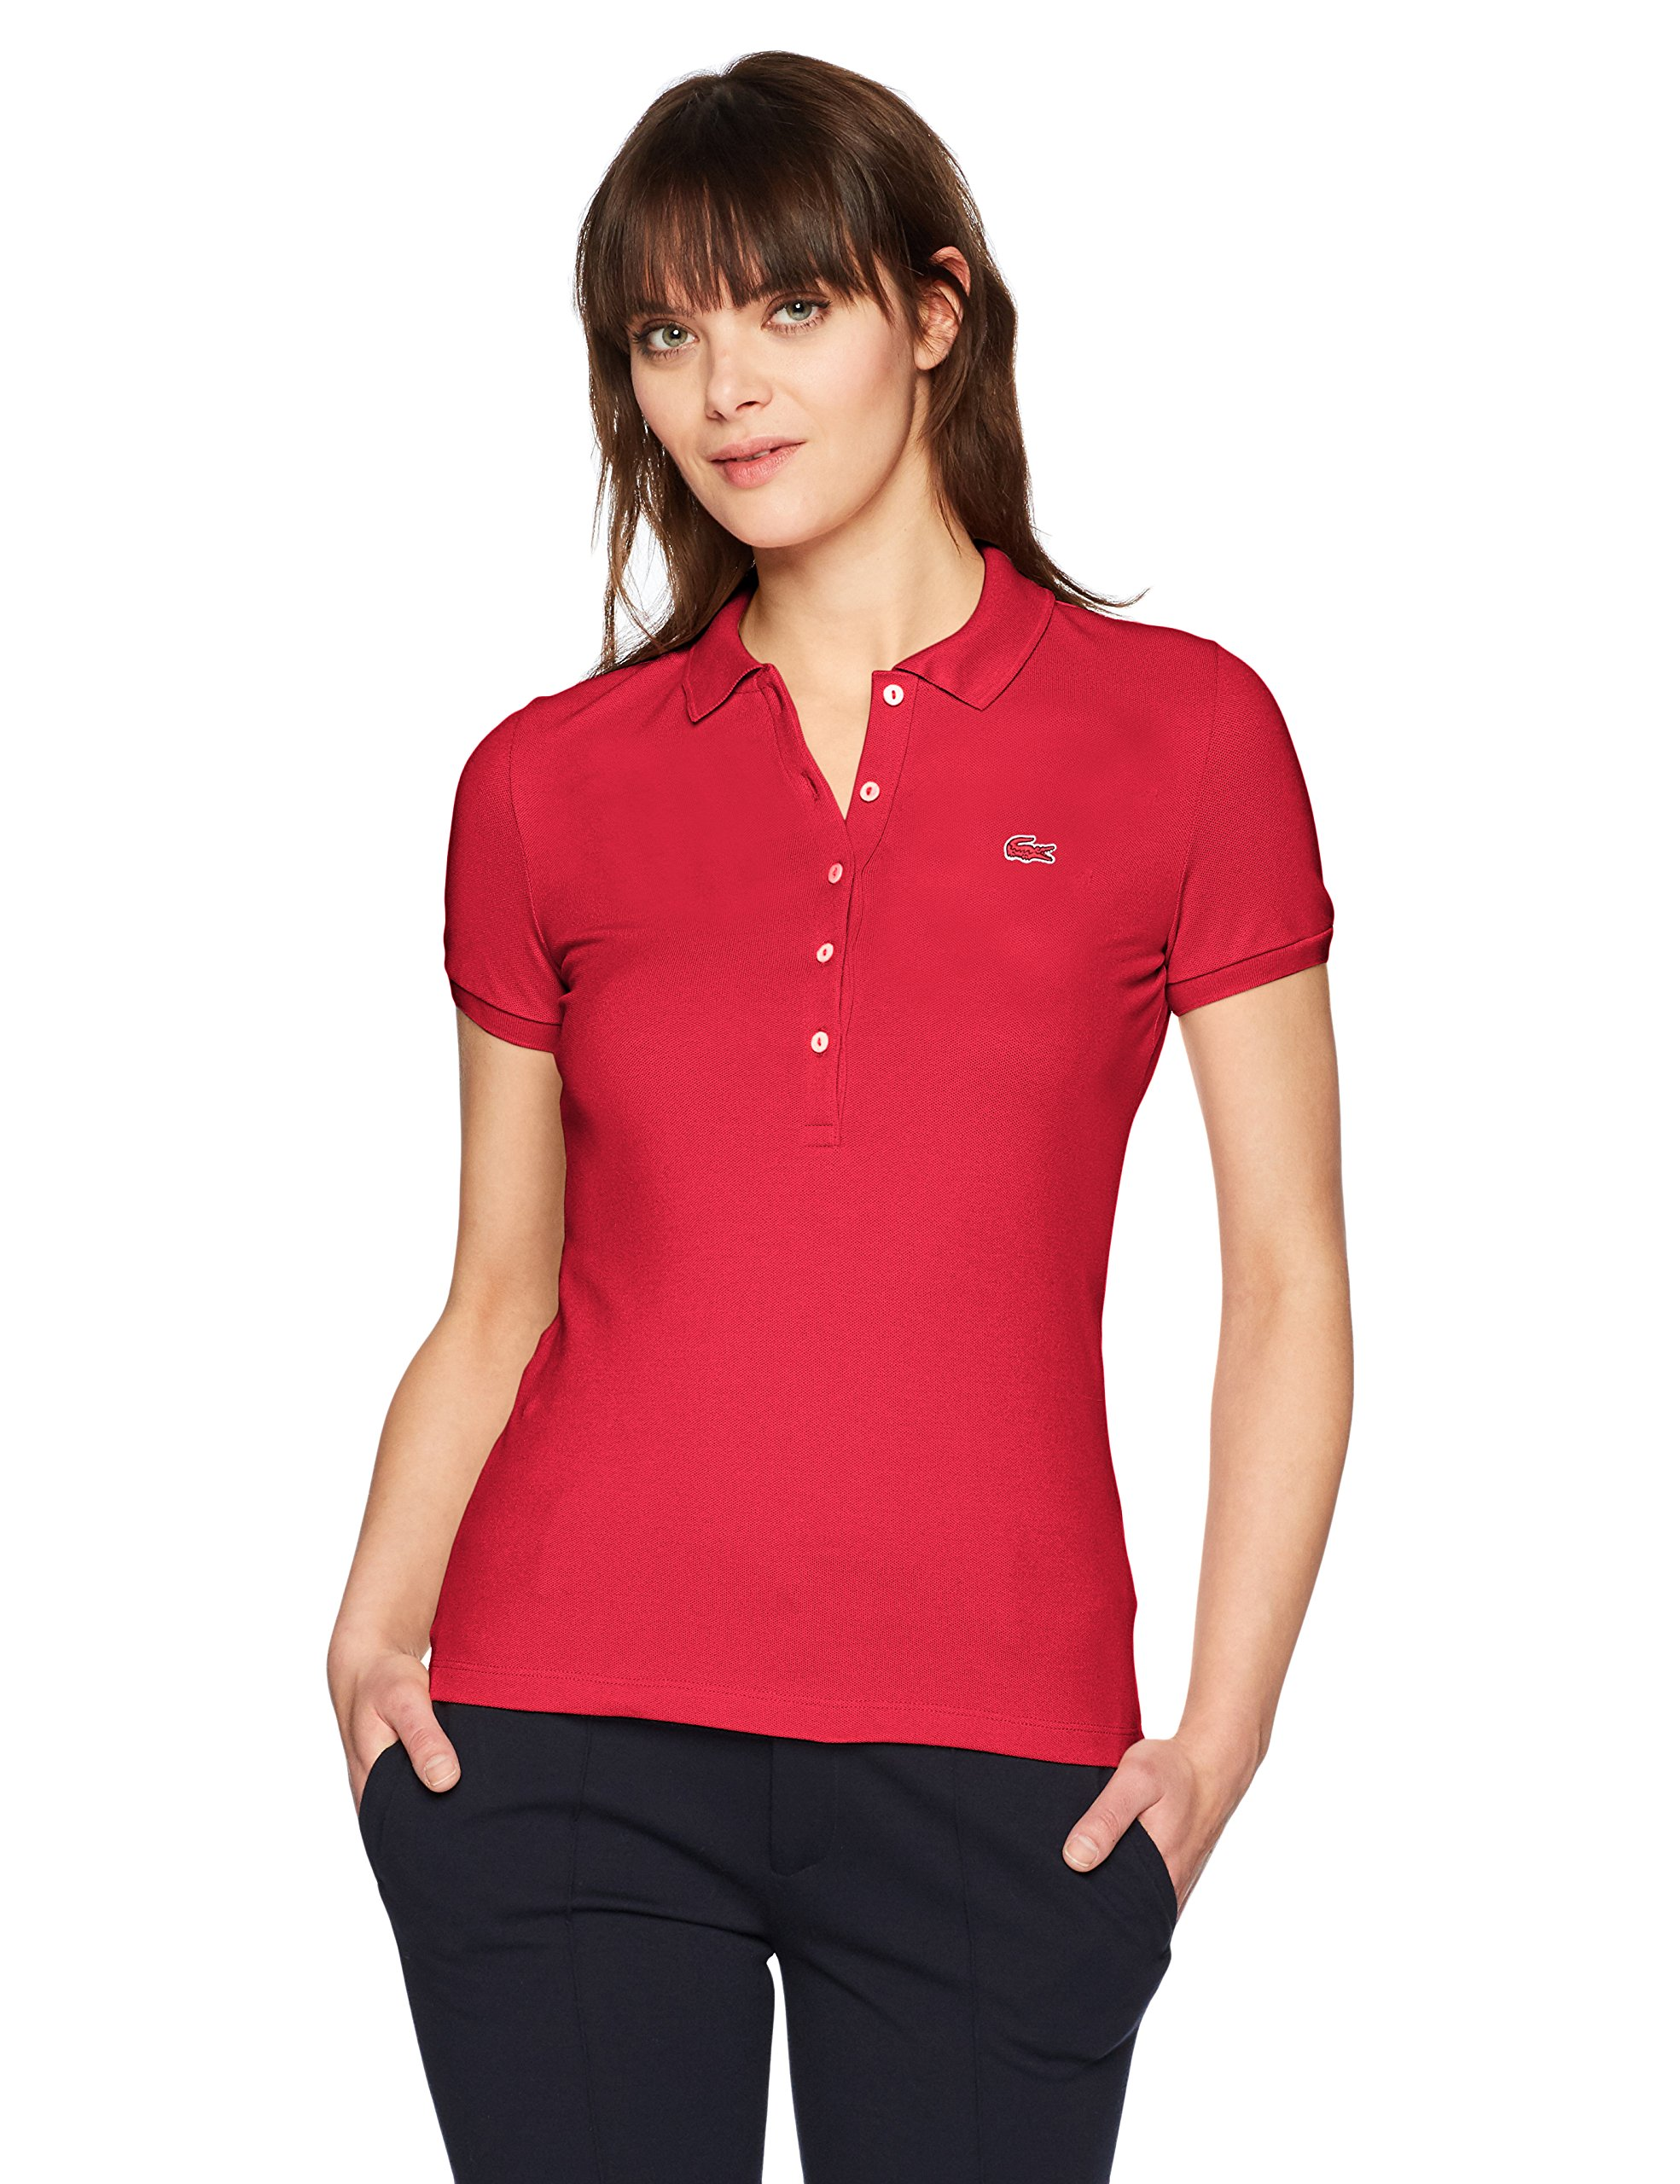 8837a0b28dc Galleon - Lacoste Women's Classic Short Sleeve Slim Fit Stretch Pique Polo,  PF7845, Toreador, 4